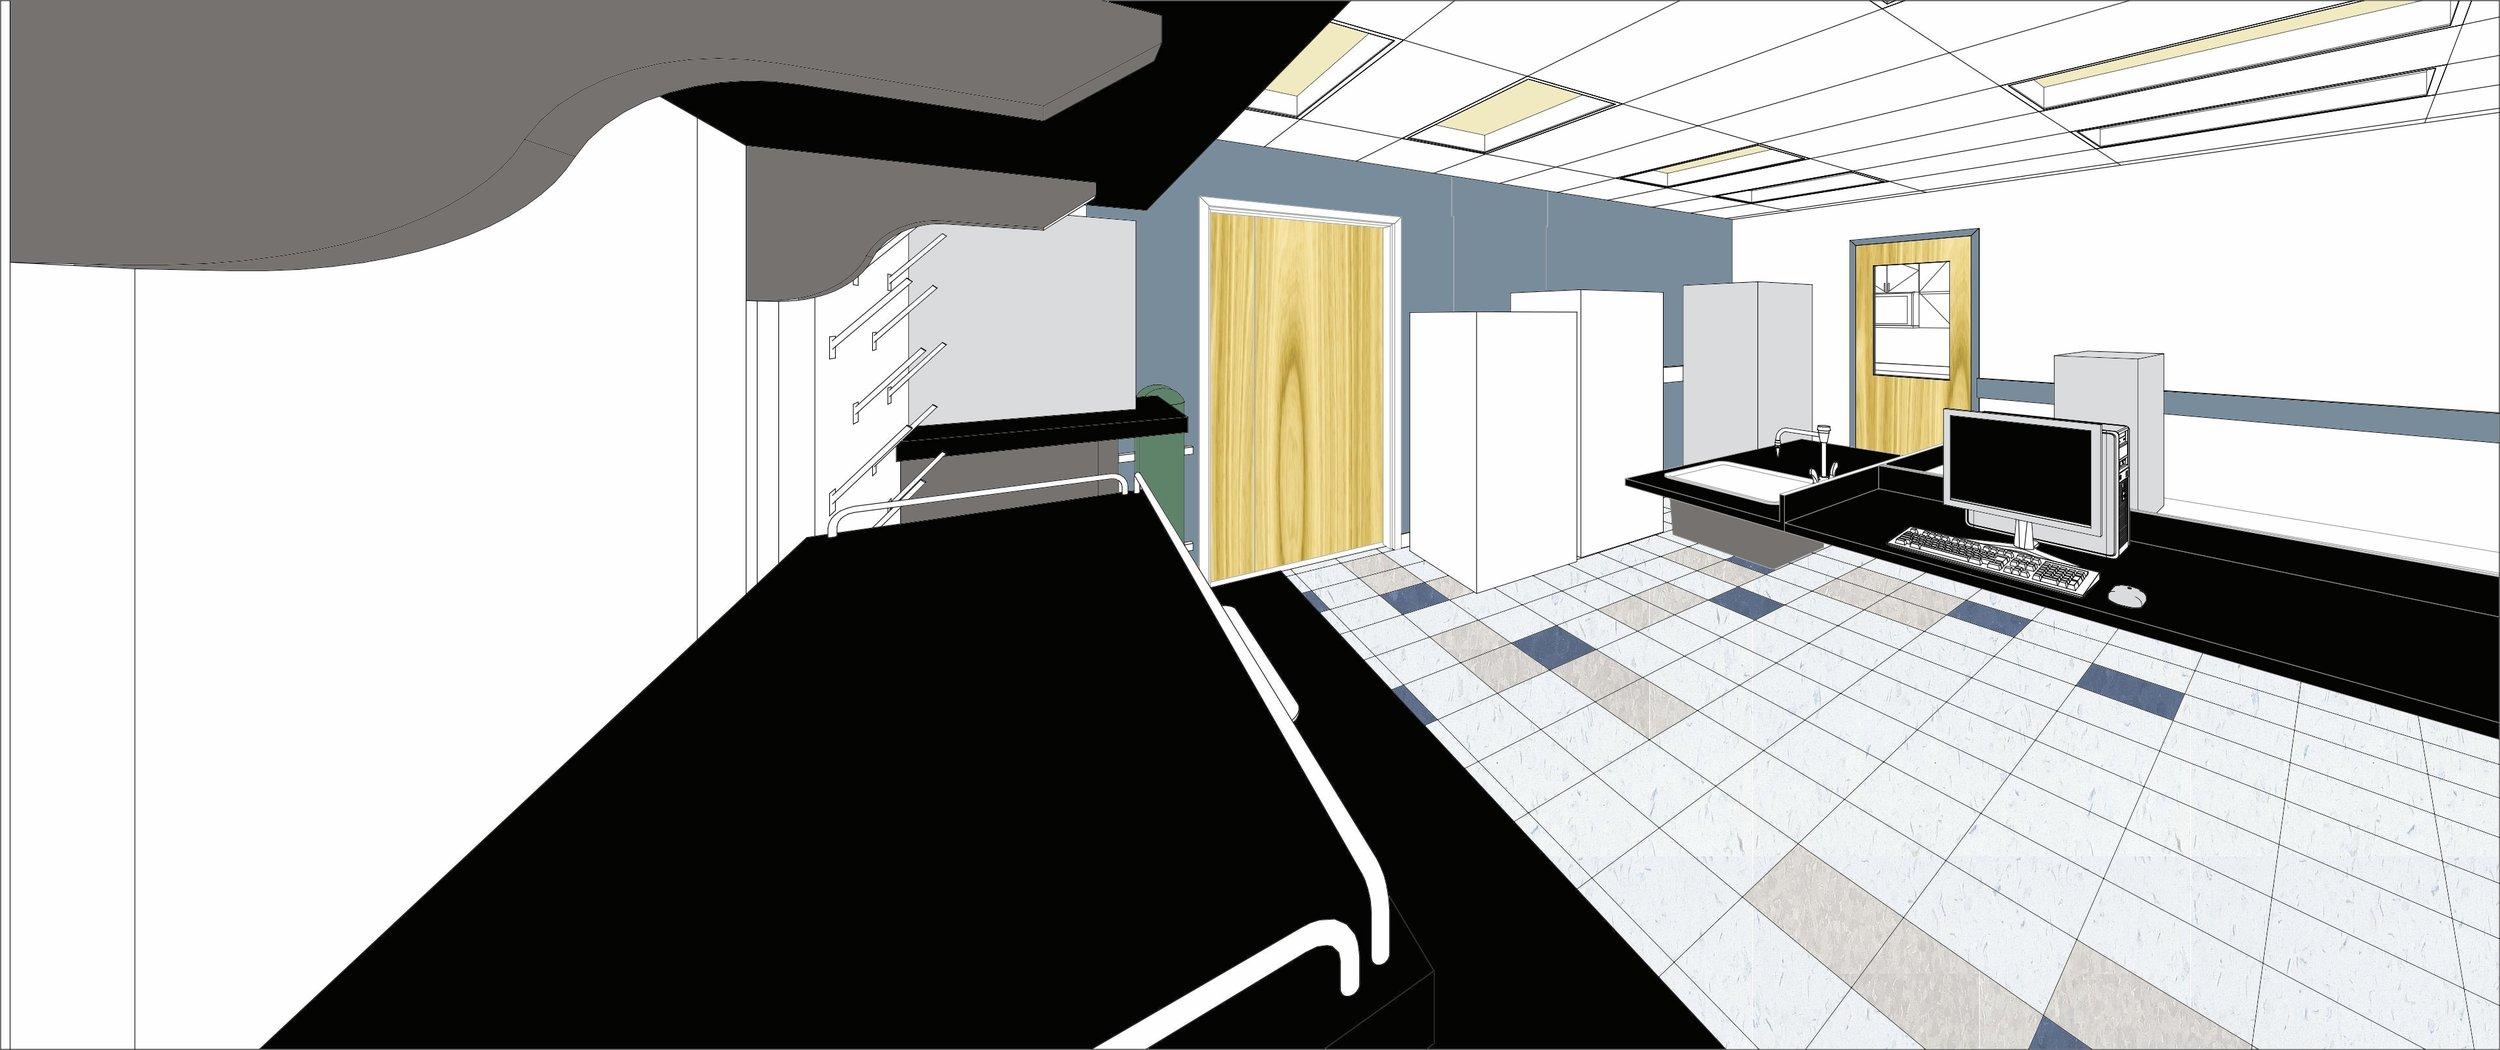 Laboratory 3310 1_BW.jpg